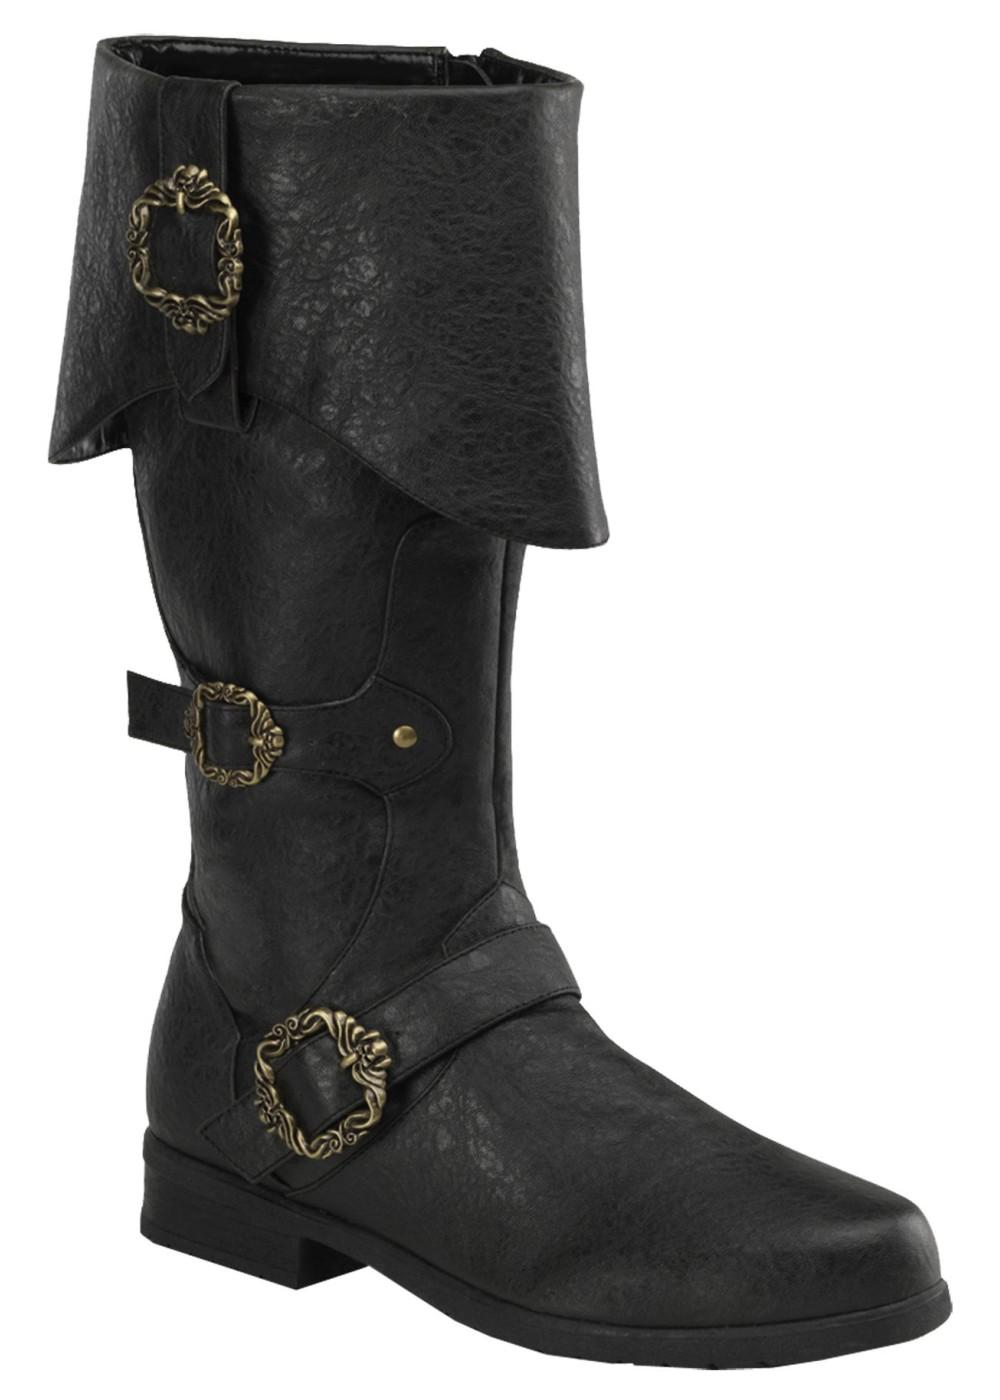 Black Pirate Boots Accessories